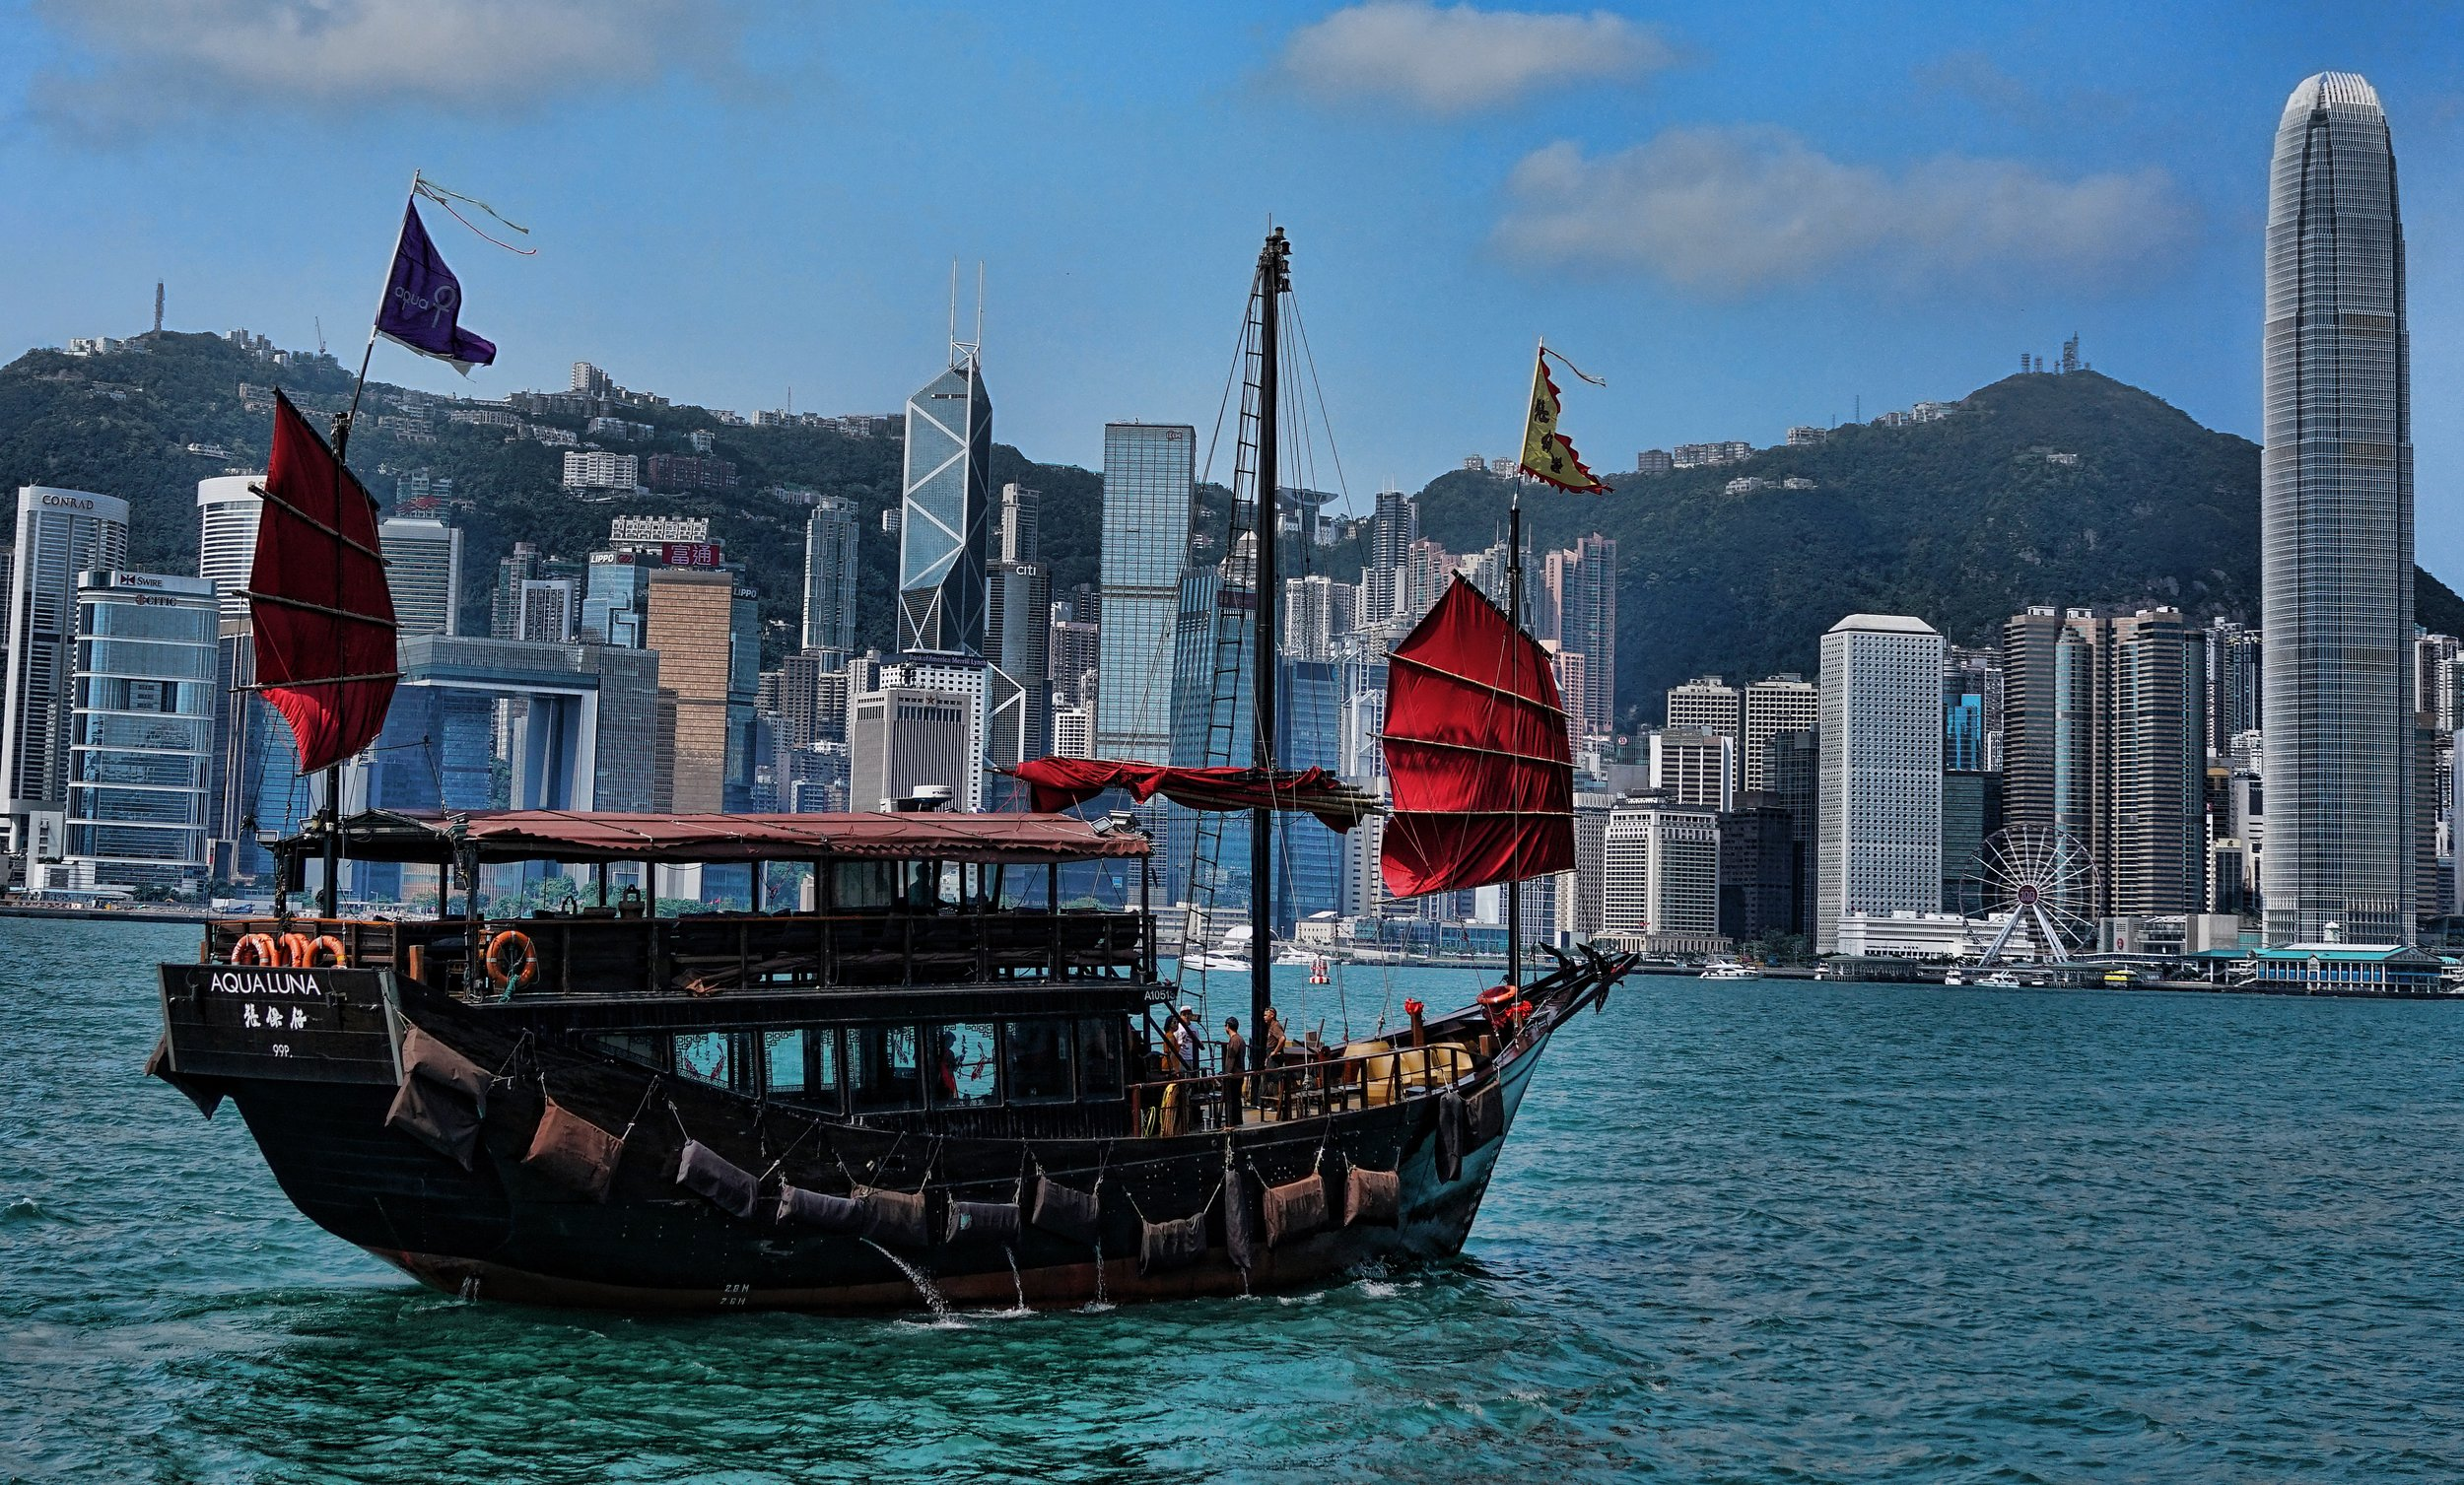 The Aqua Luna, Tour Boat, Hong Kong Harbour May 2019 (7).JPG